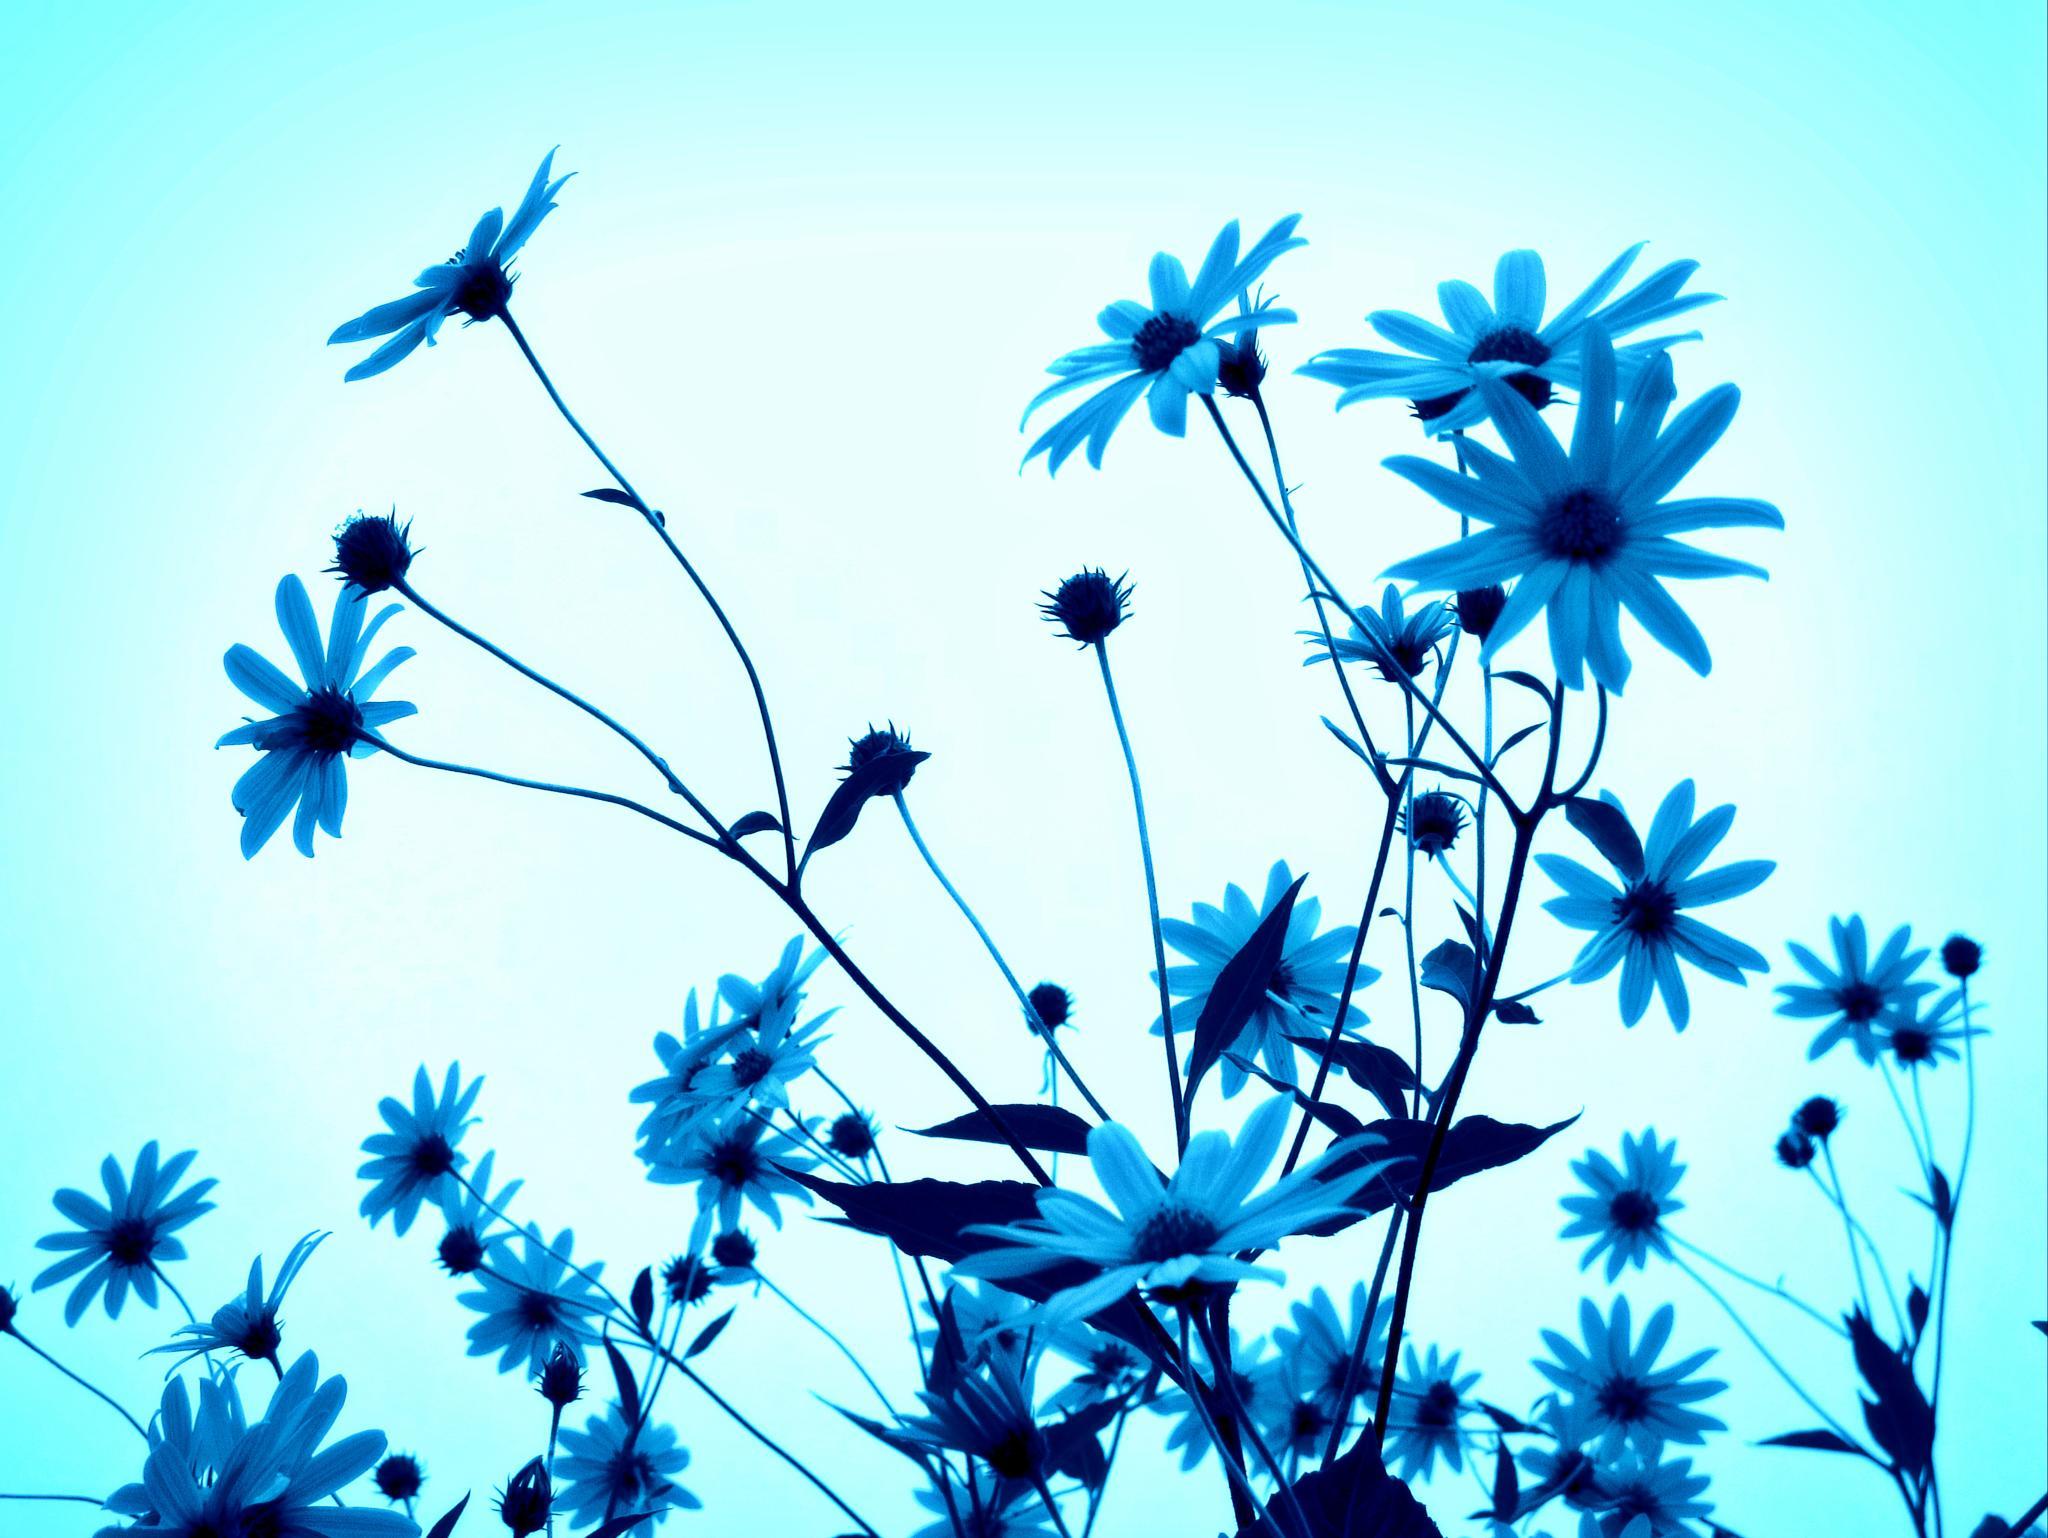 azul by angelgarcia